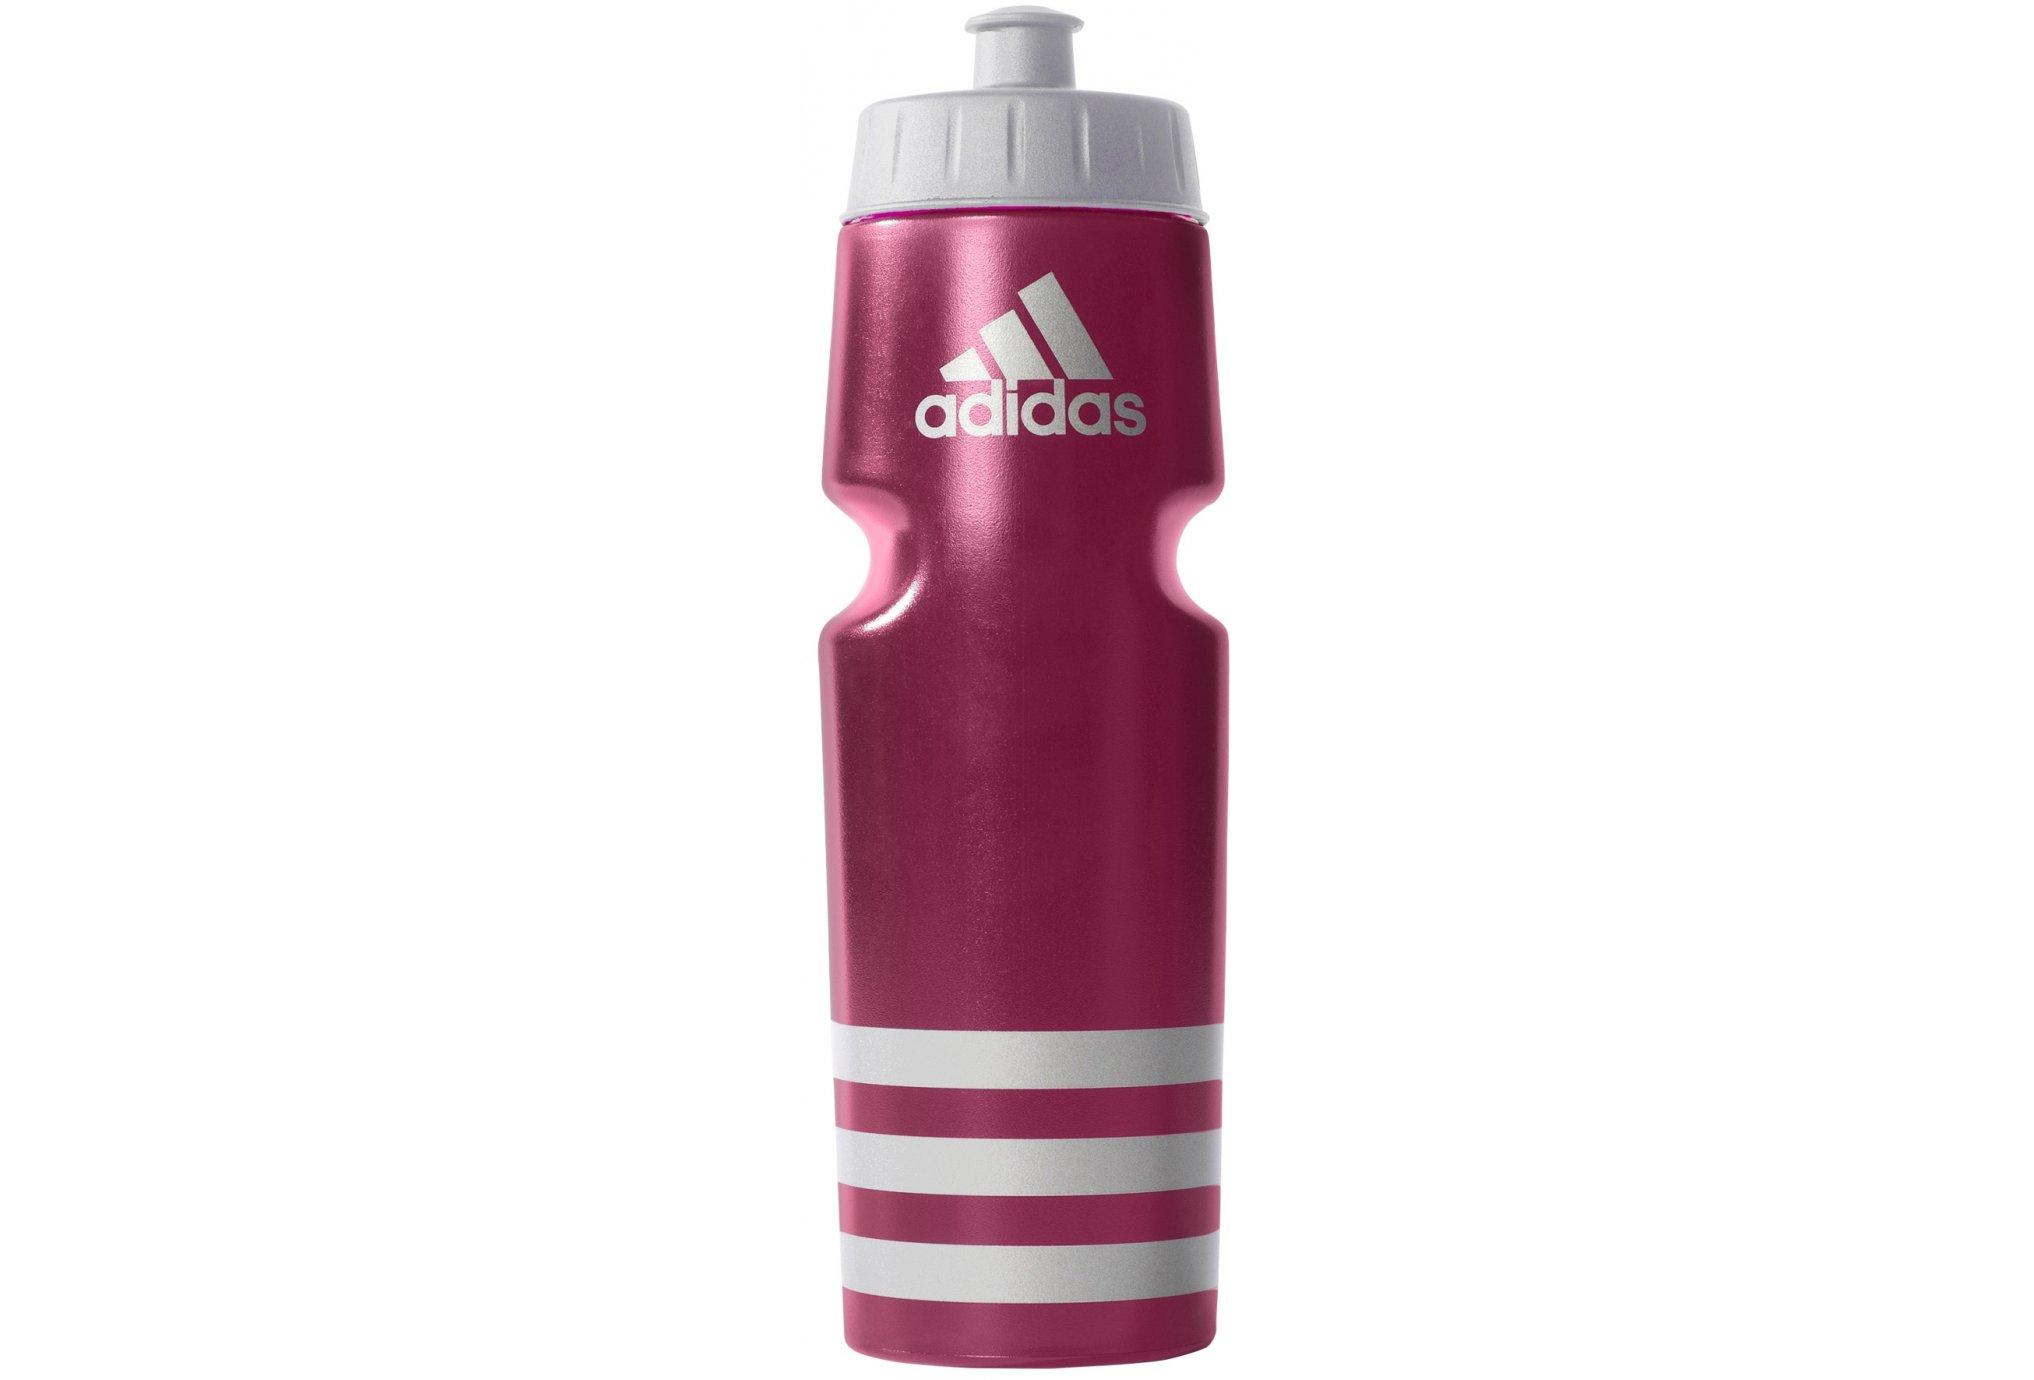 Adidas Bidon performance 3 stripes 750ml hydratation / sacs à dos